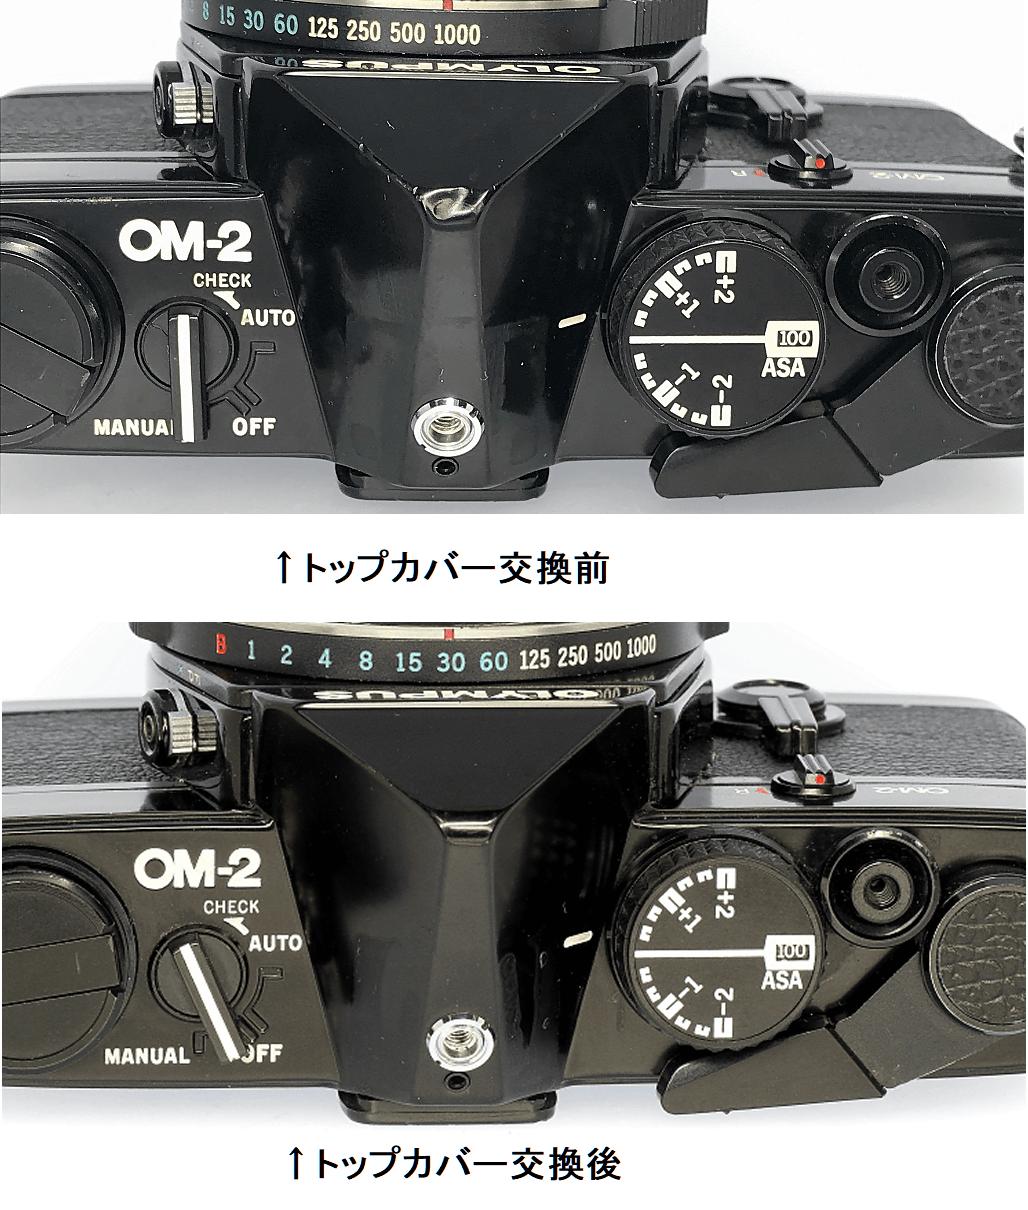 OLYMPUS OM-2 トップカバー交換